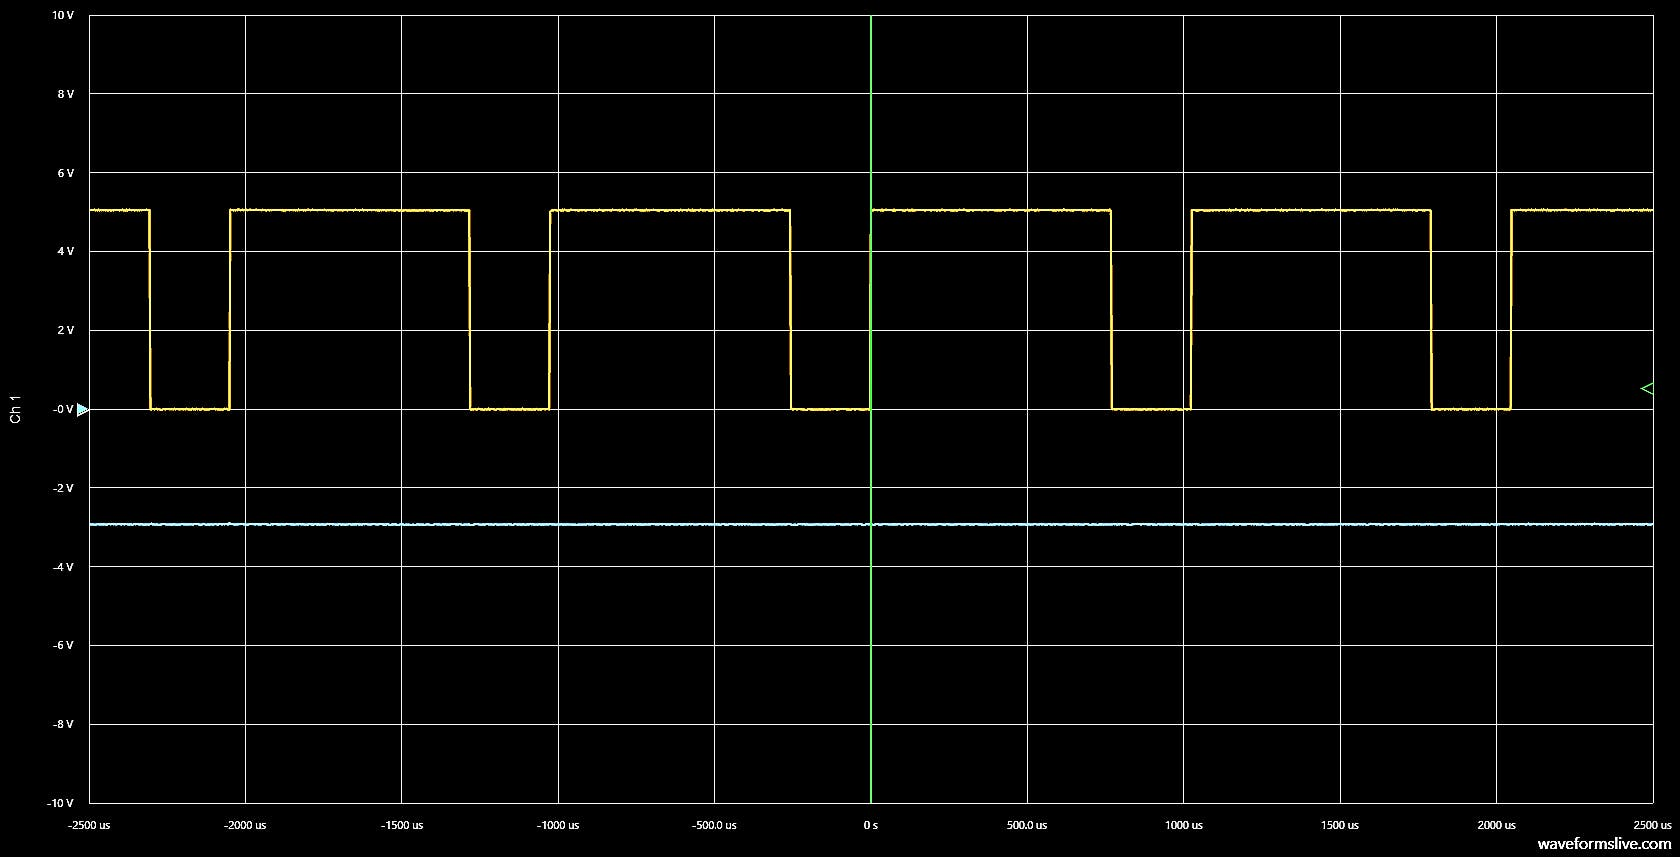 WaveForms Live screenshot of 75% vs 100% duty cycle.